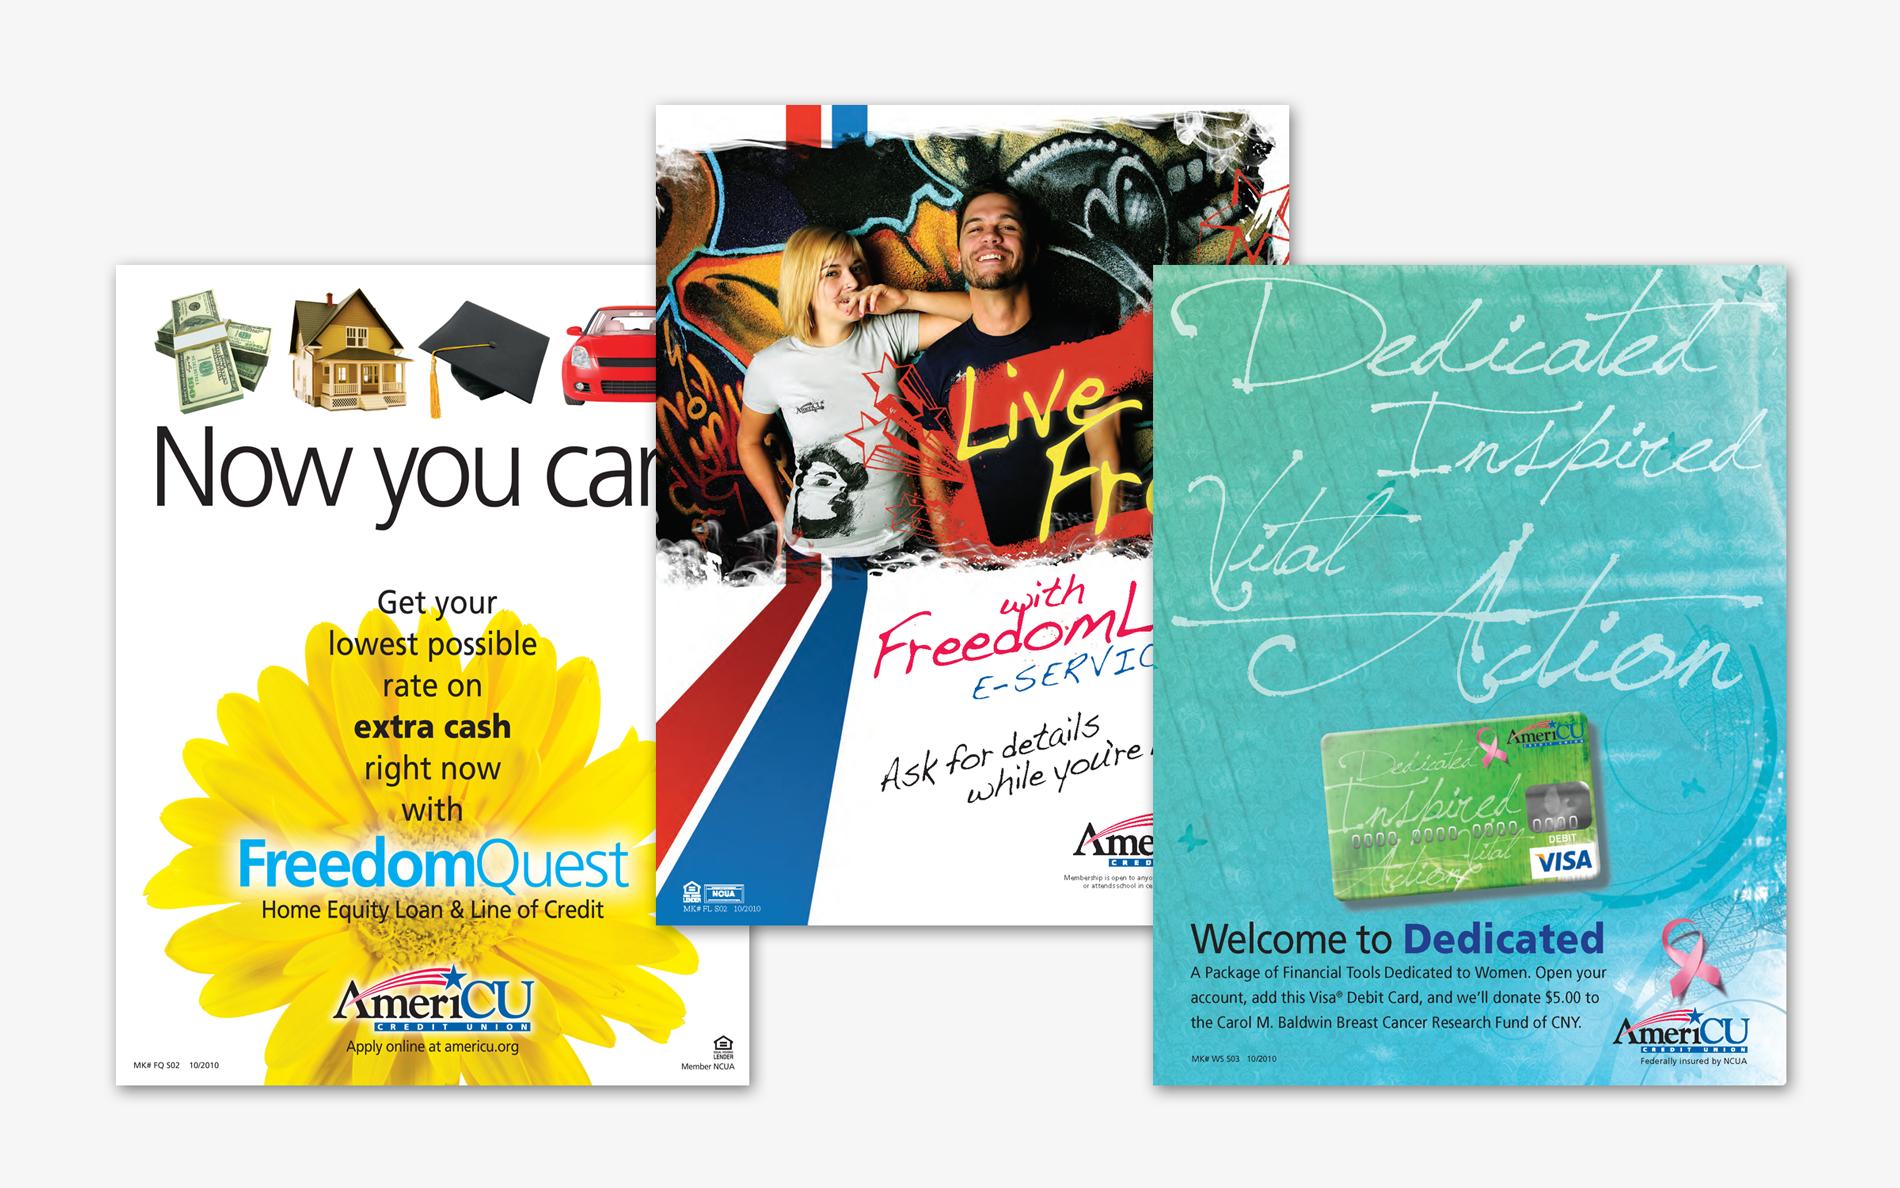 AmeriCU Campaign Posters, Before